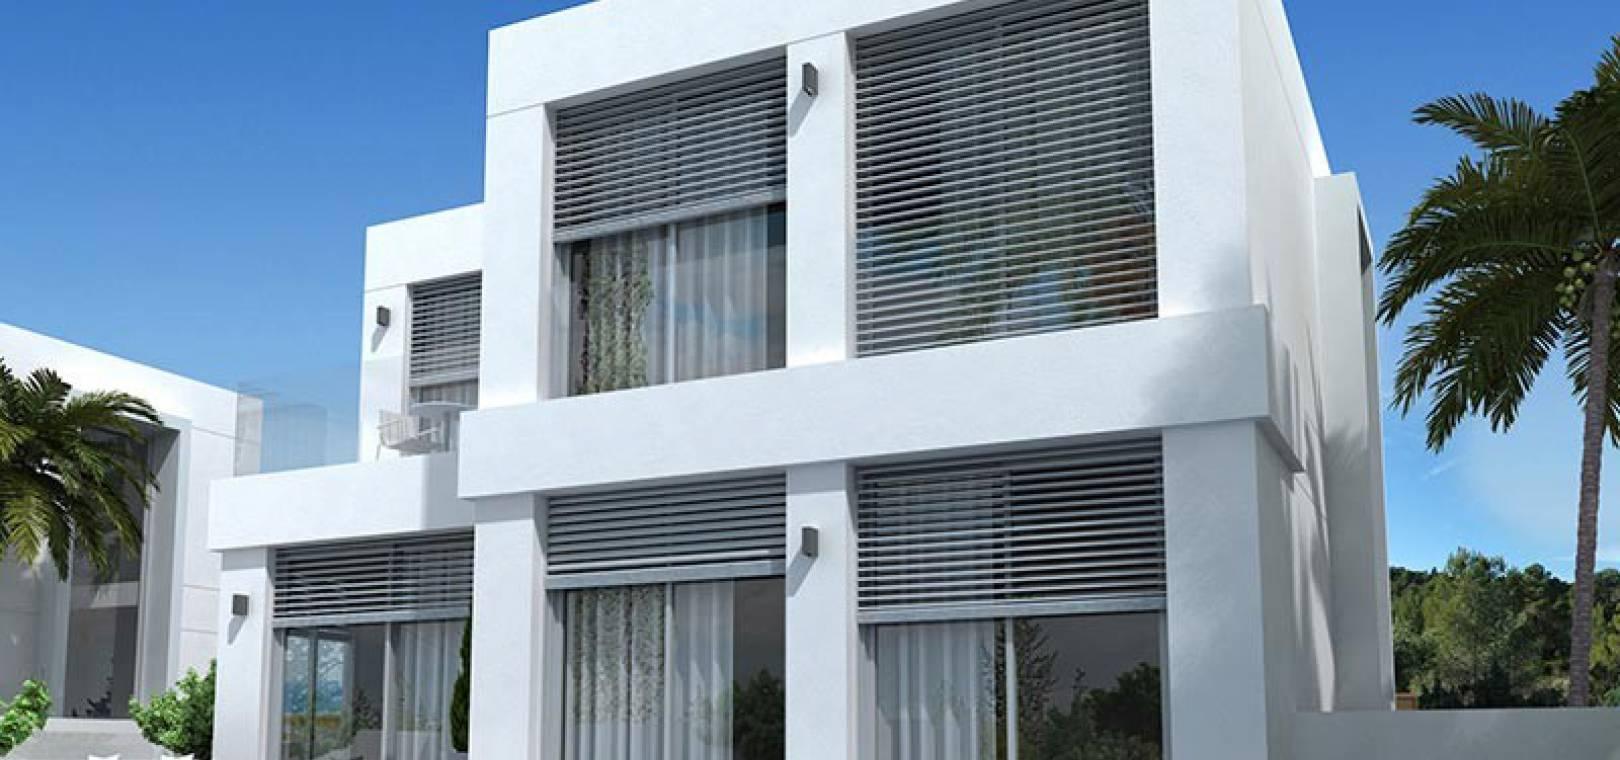 to buy,villas,modern,guardamar hills,guardamar,costa,blanca,op16=front